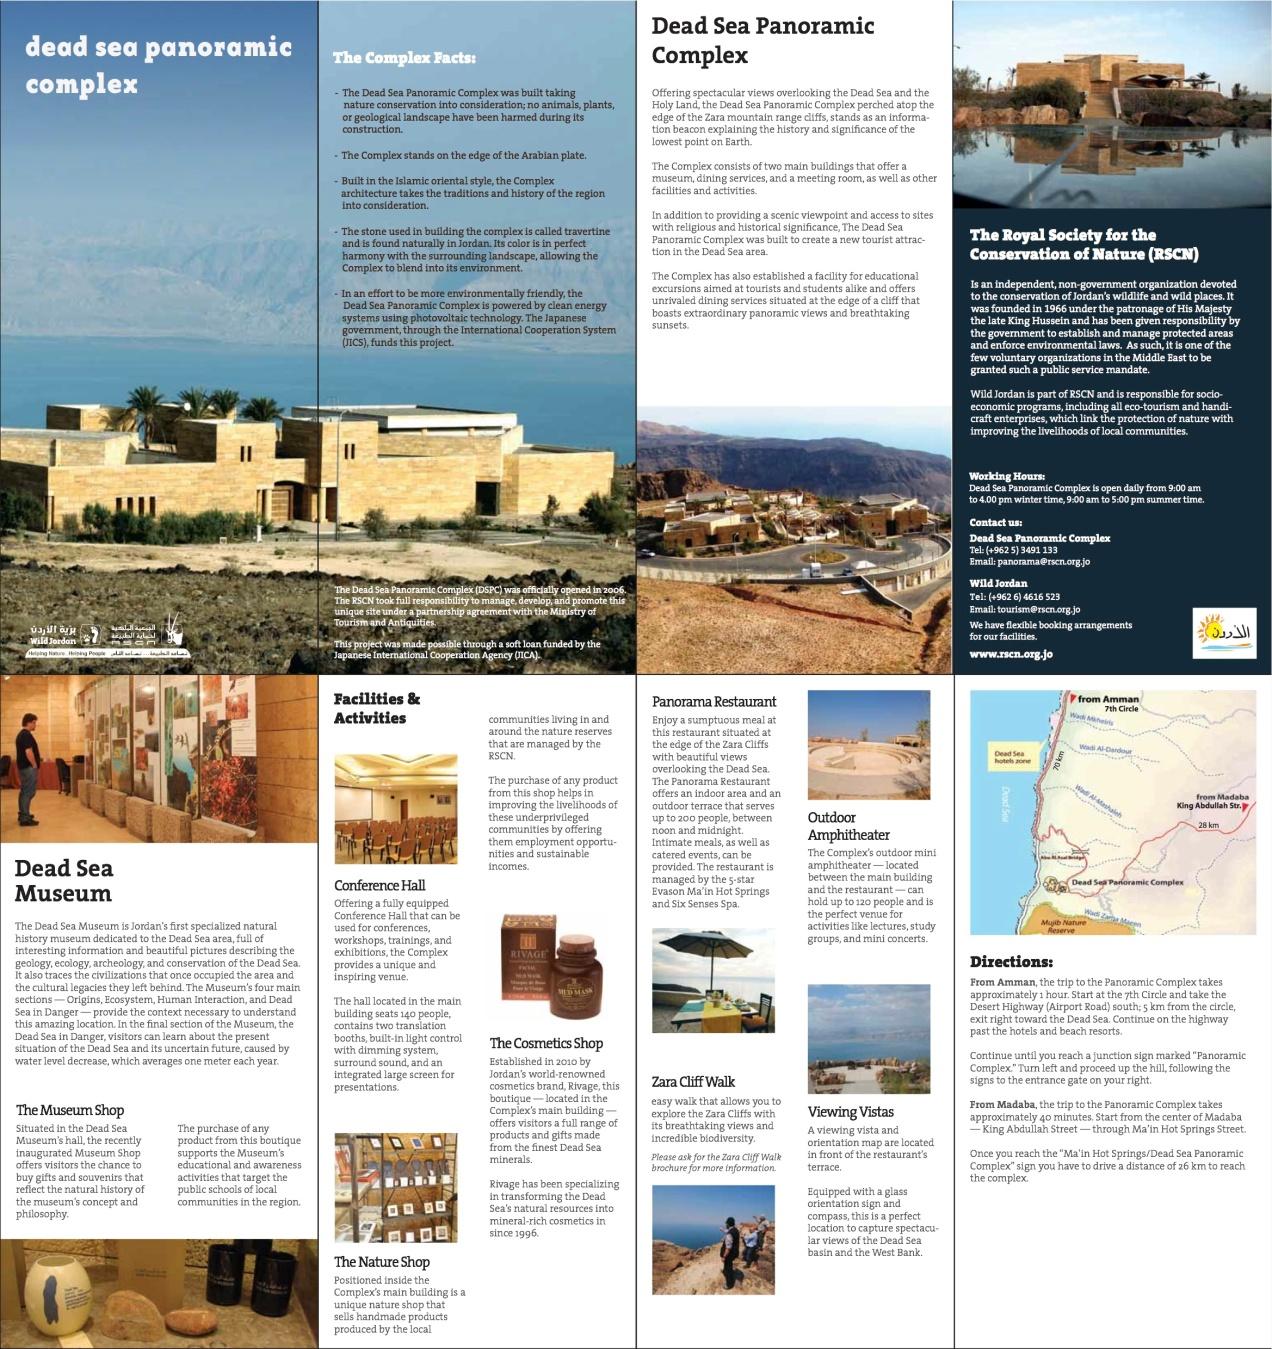 Dead Sea Panoramic Complex brochure